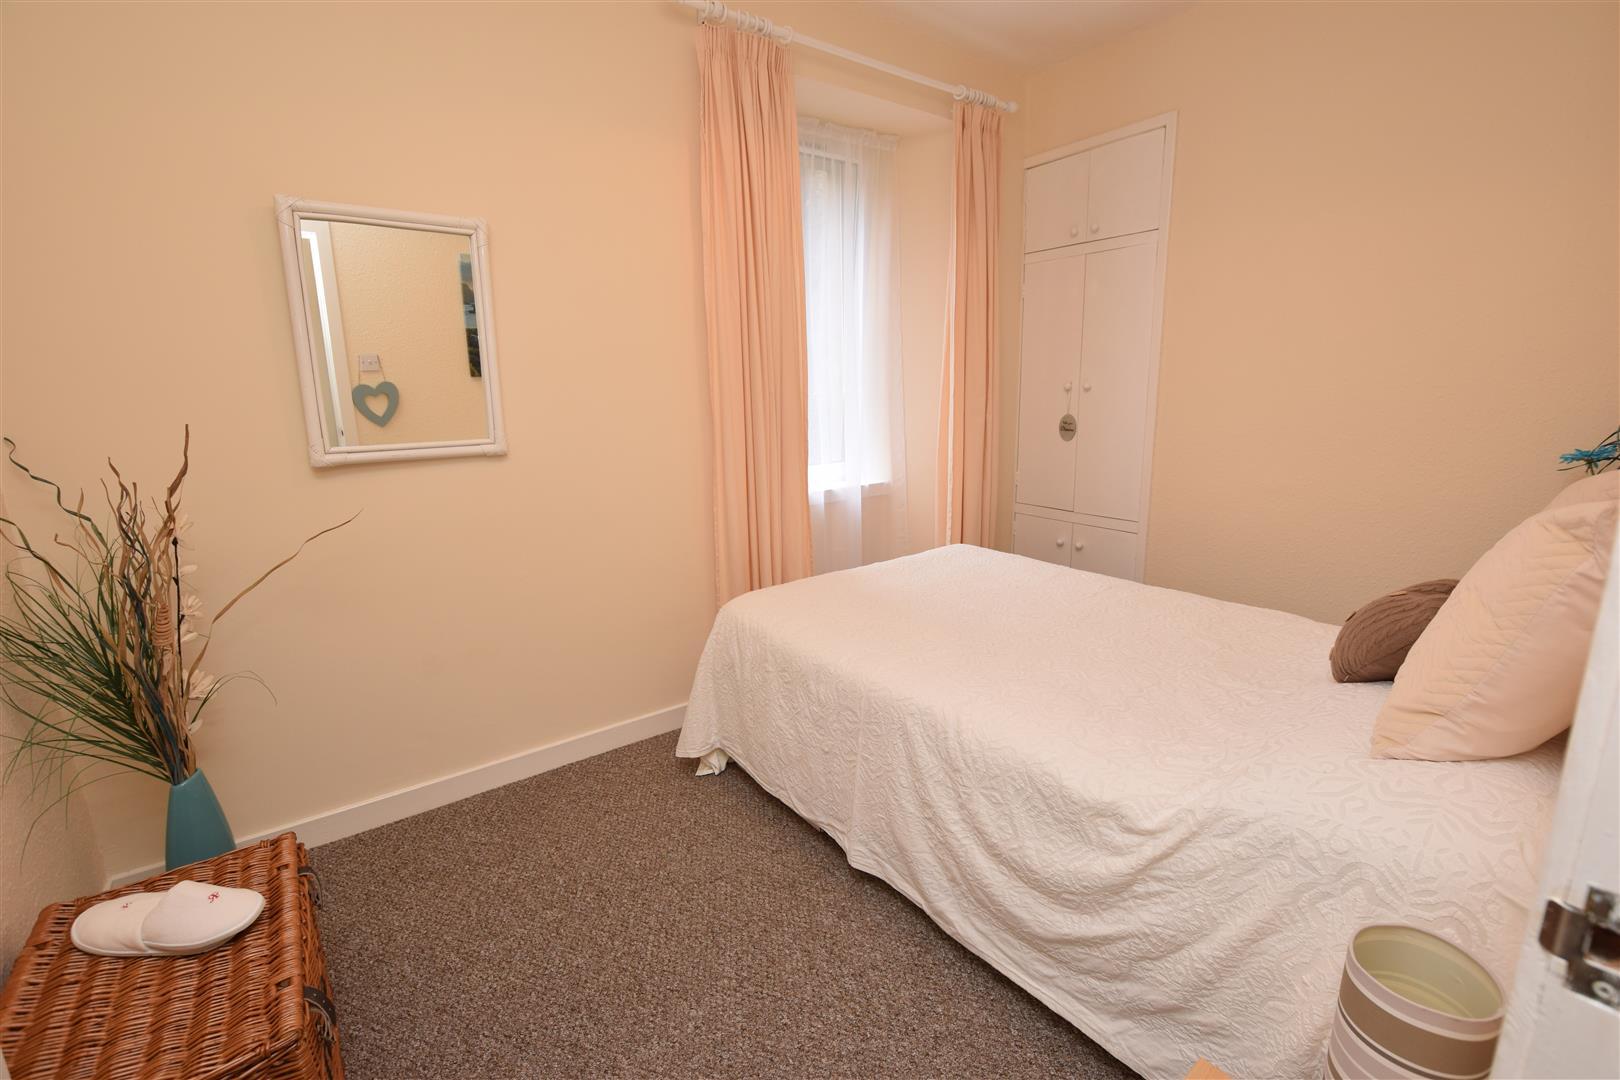 Flat 2, 9, St. Johns Place, Perth, Perthshire, PH1 5SZ, UK